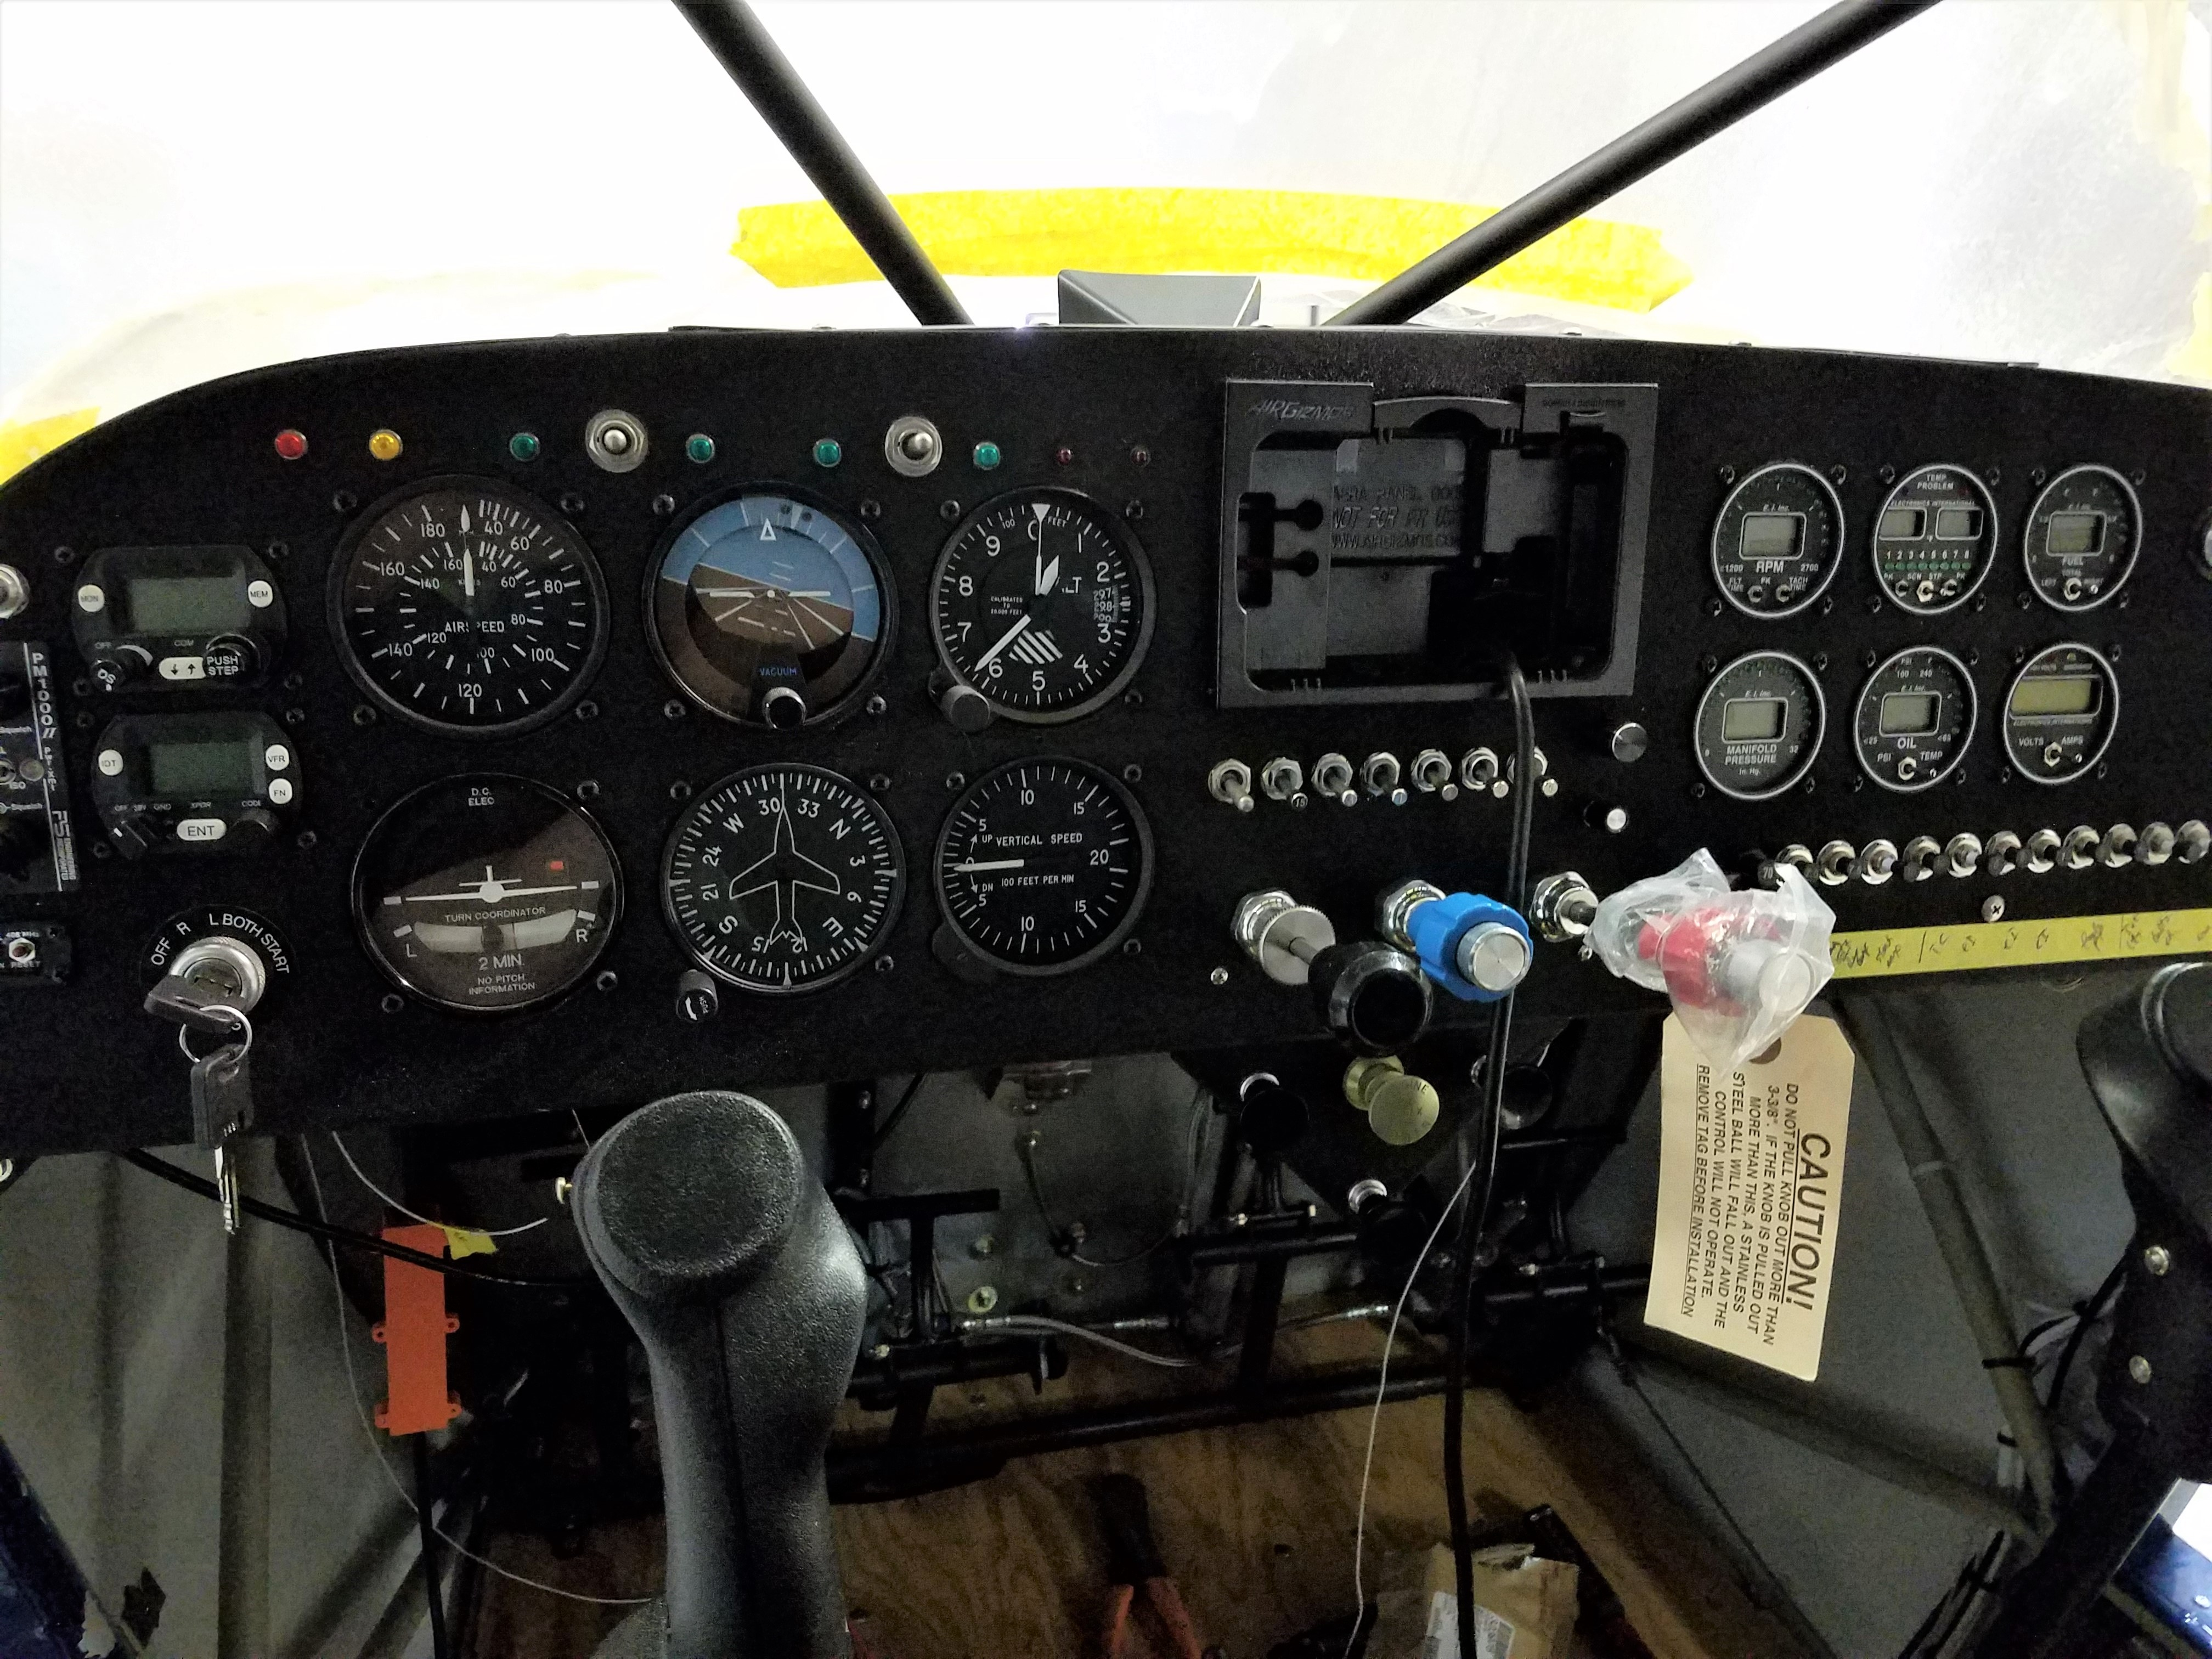 Bearhawk 4-Place panel